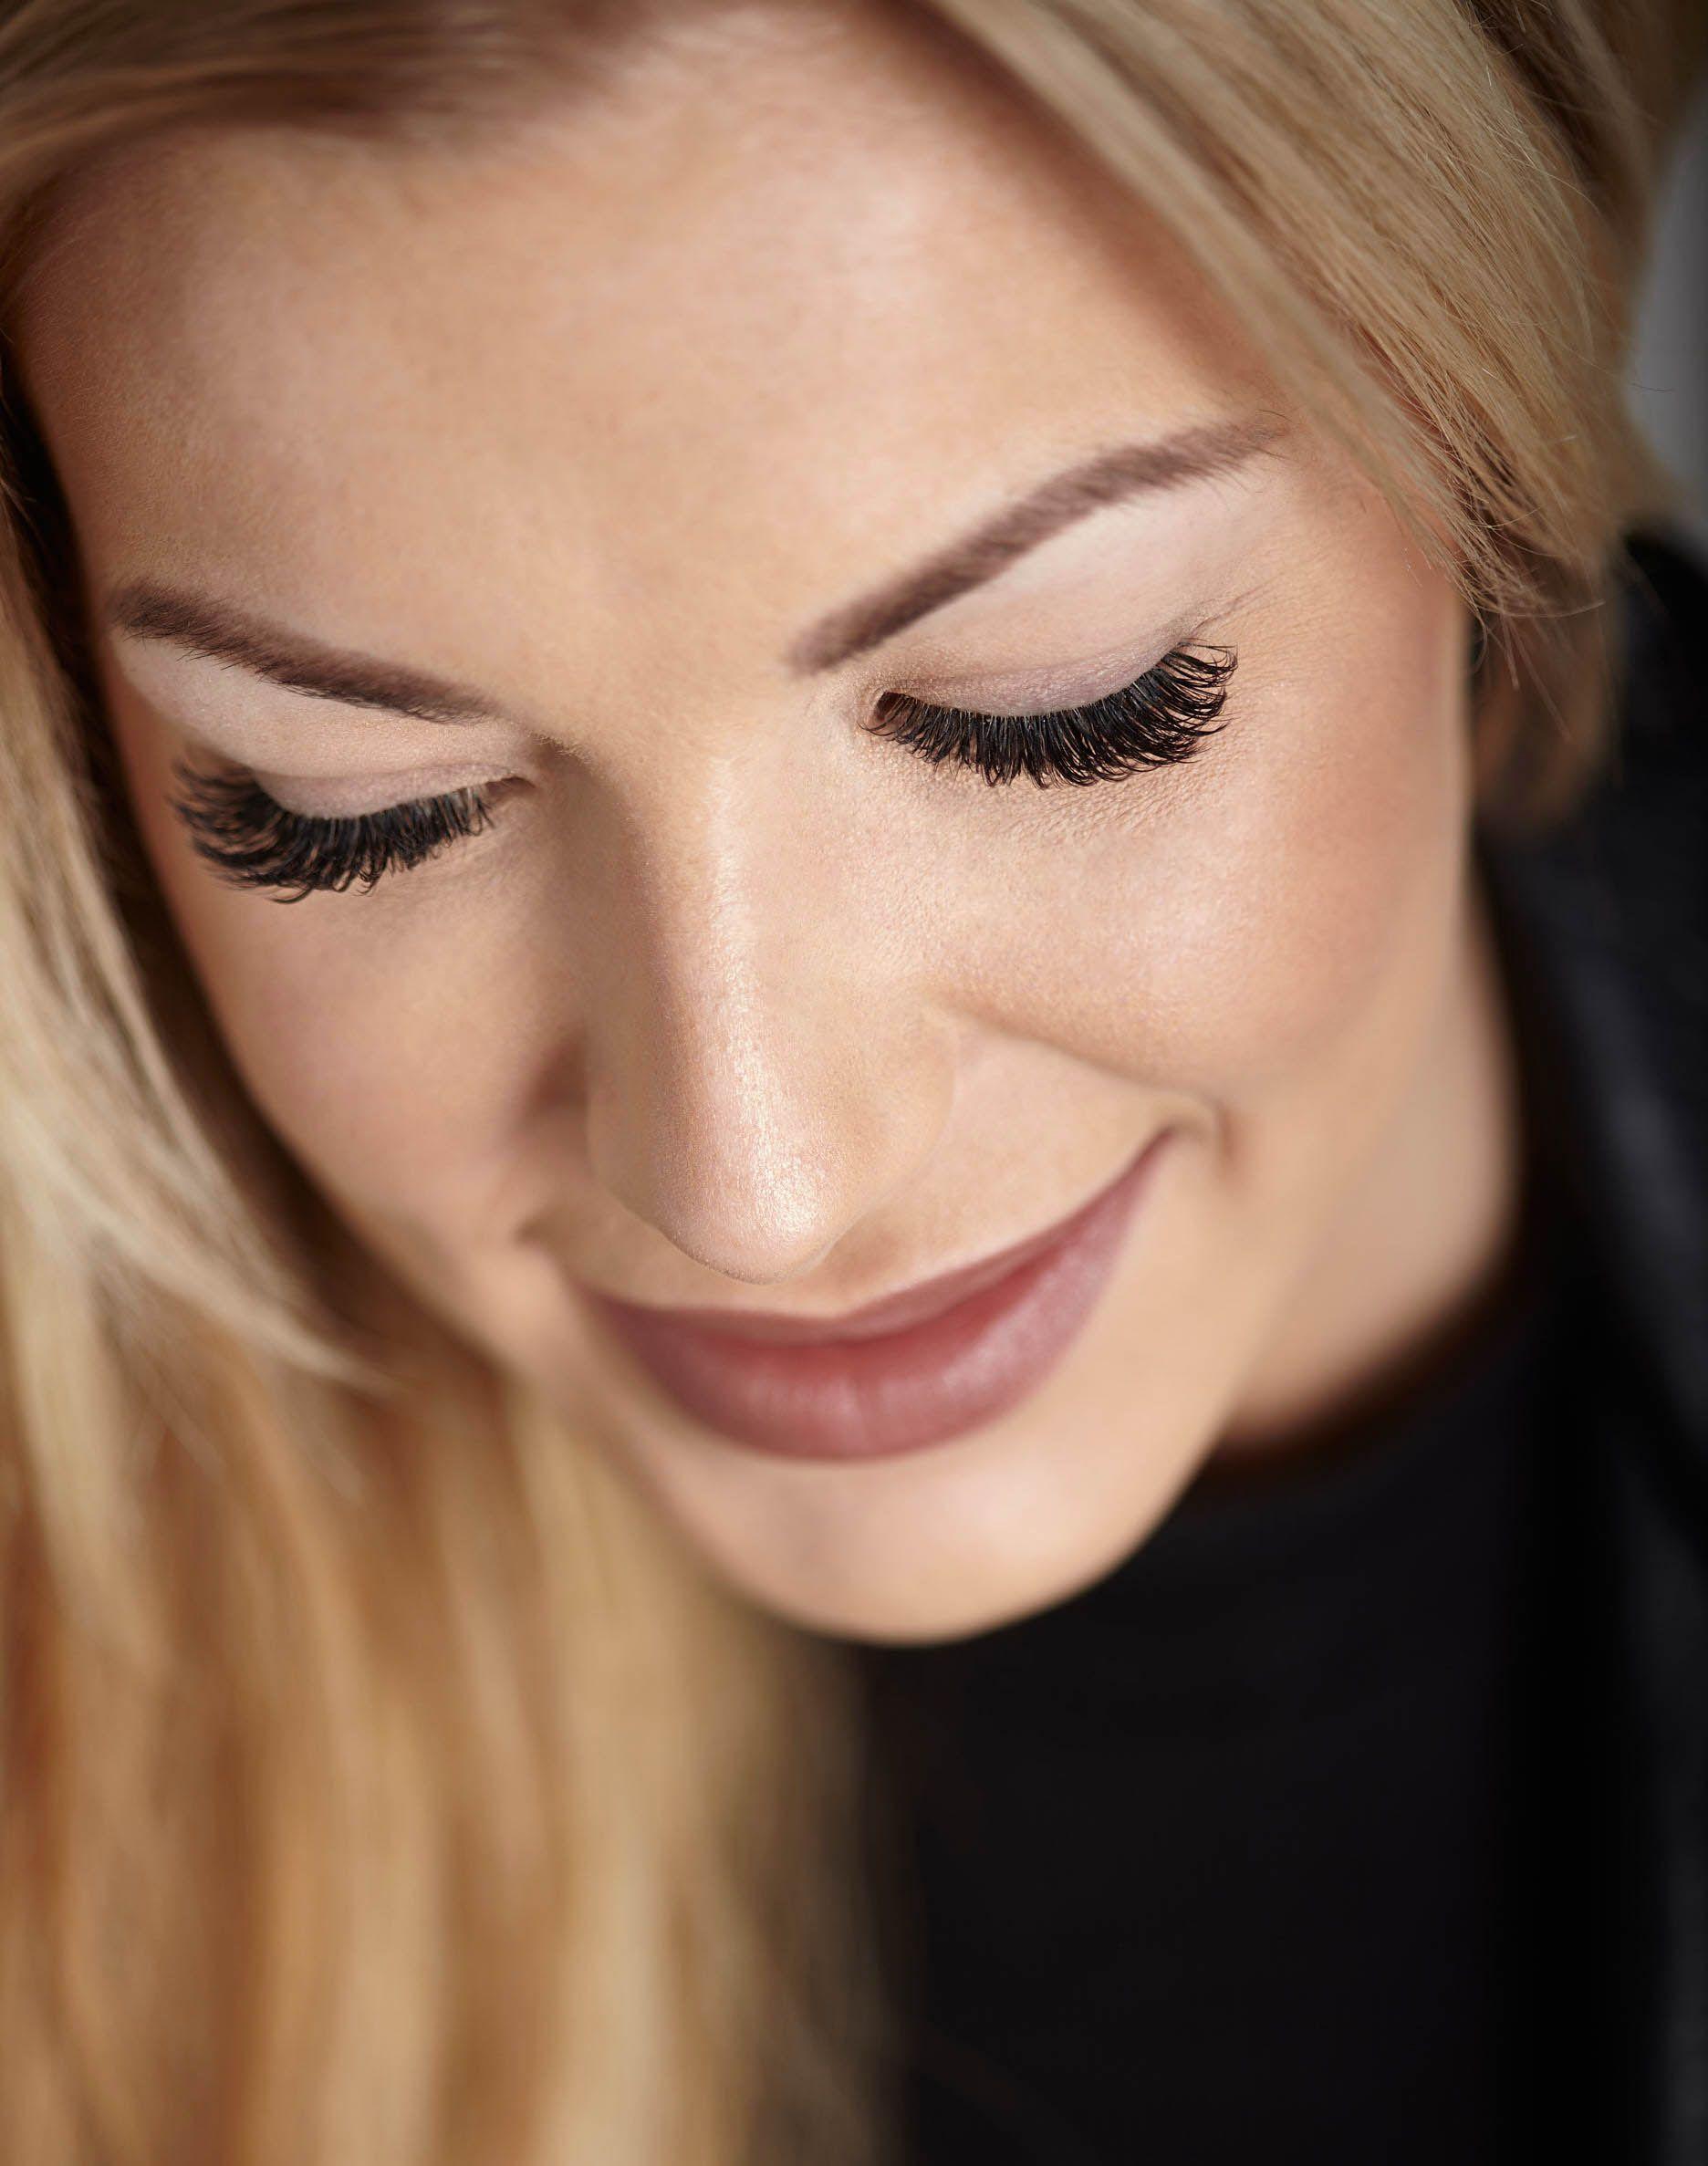 Vivien Konca Miss Germany 2014 mit perfekten Wimpern! Mehr